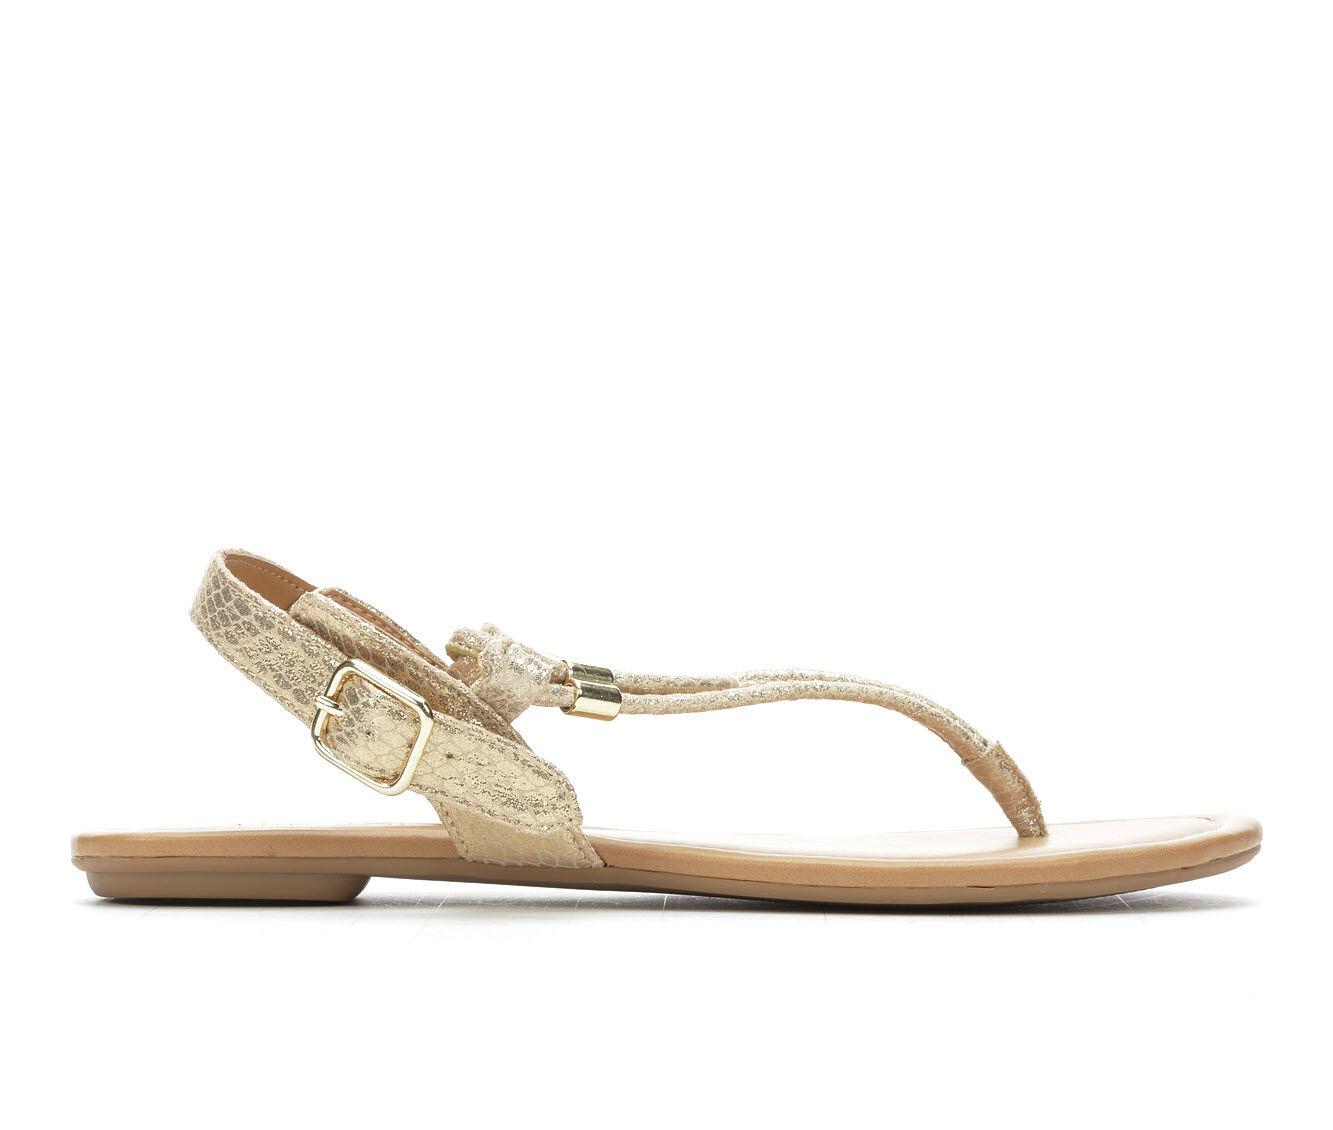 uk shoes_kd7403